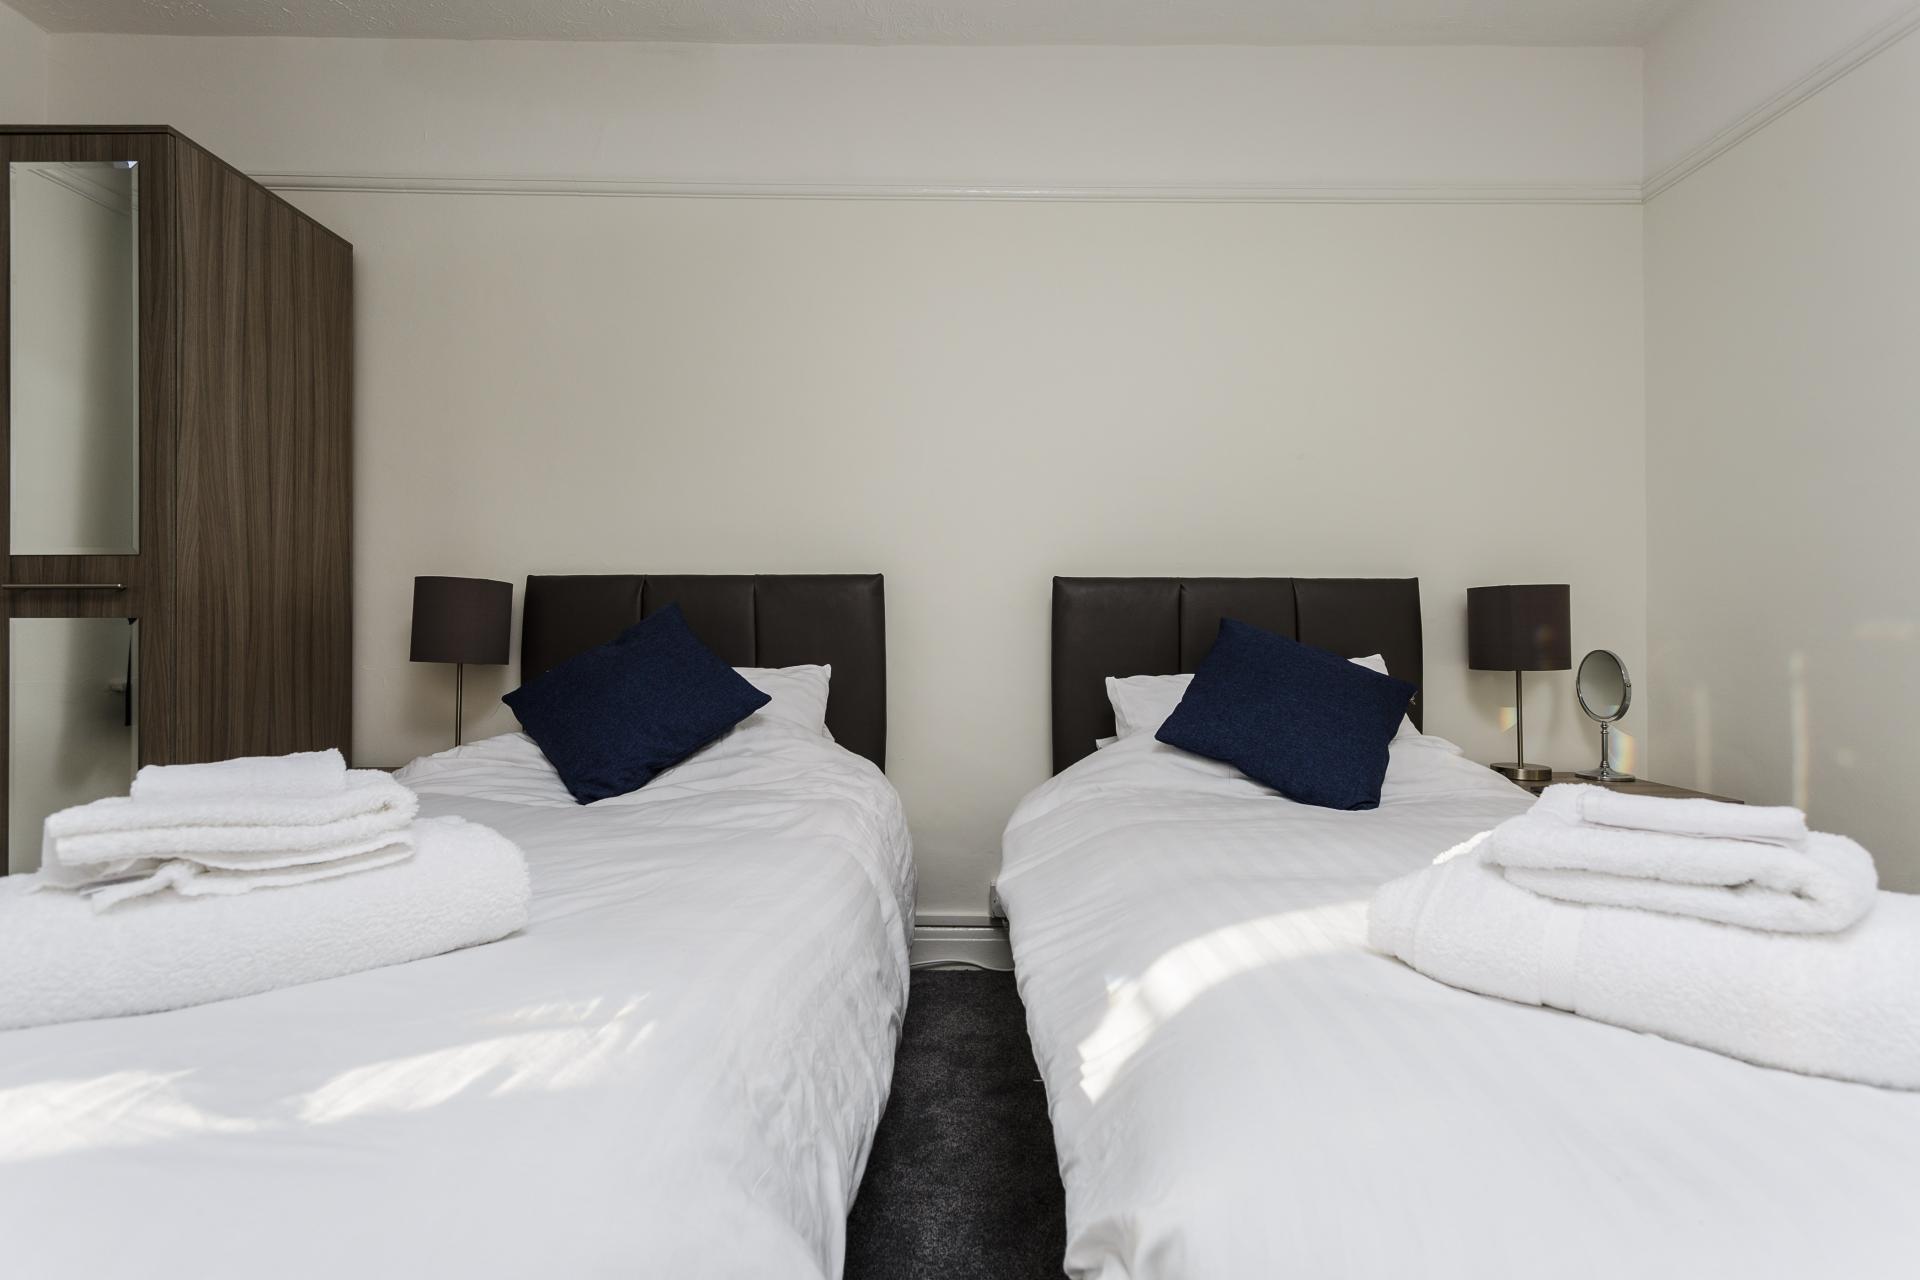 Beds at Braganza House Apartments, Old Portsmouth, Portsmouth - Citybase Apartments